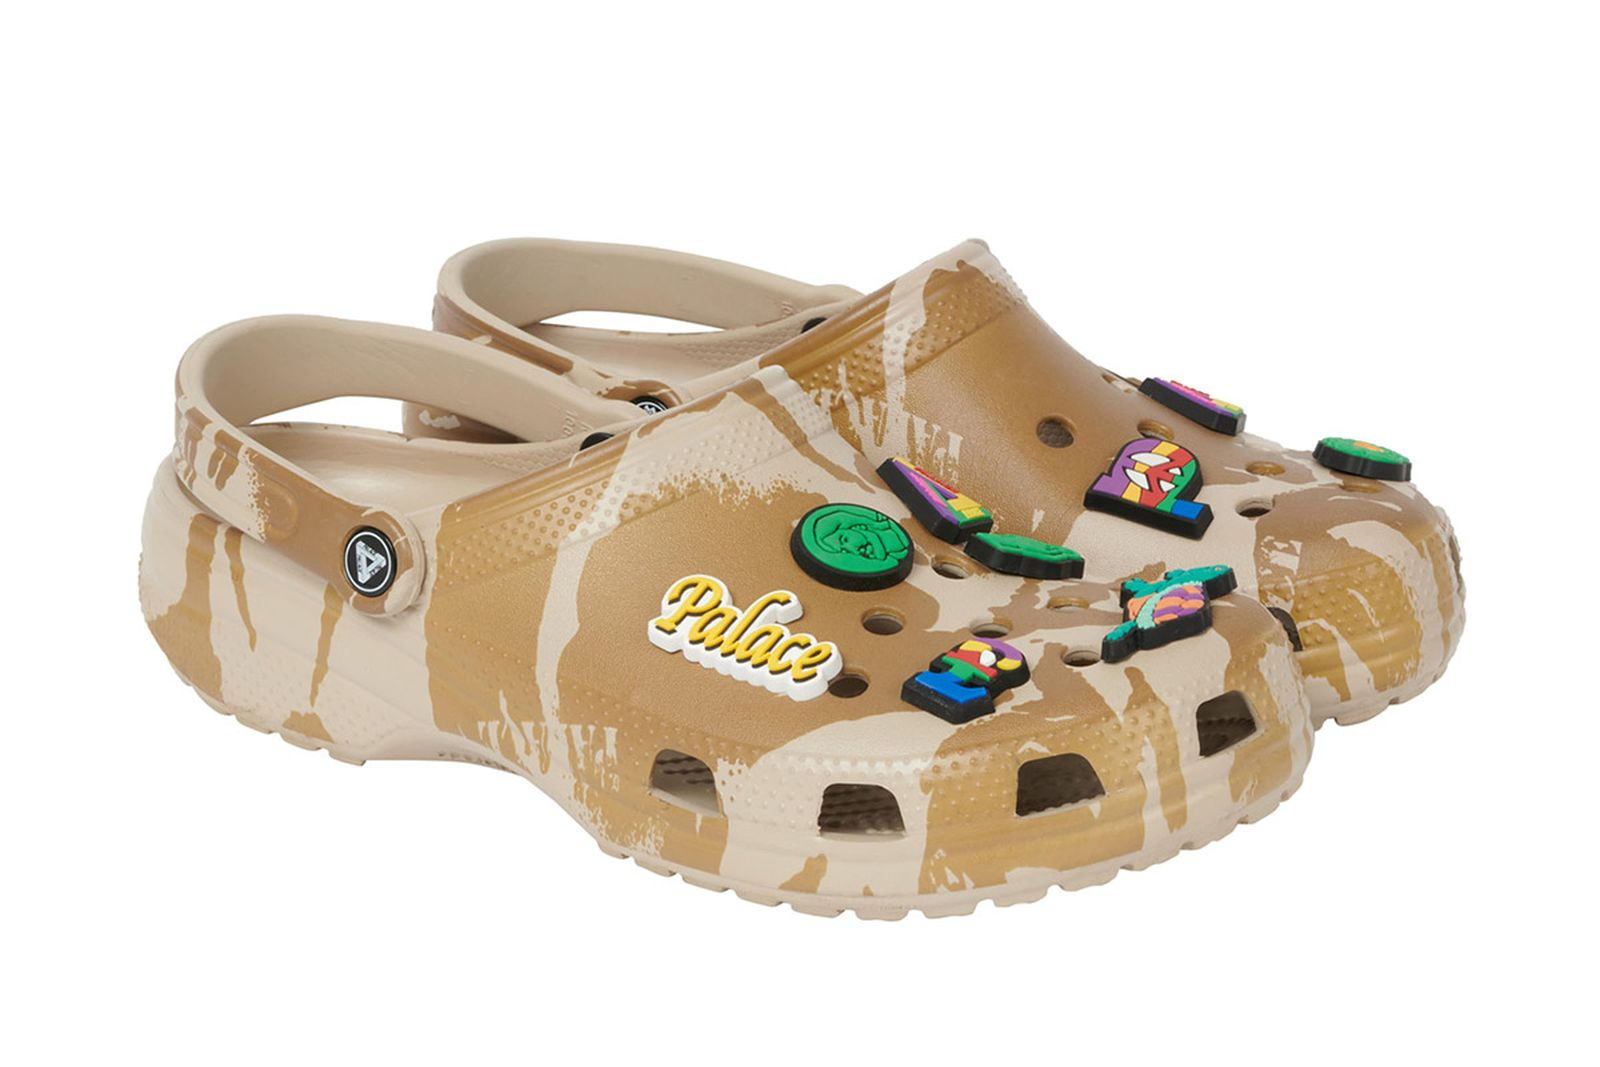 palace-crocs-classic-clog-release-date-price-01